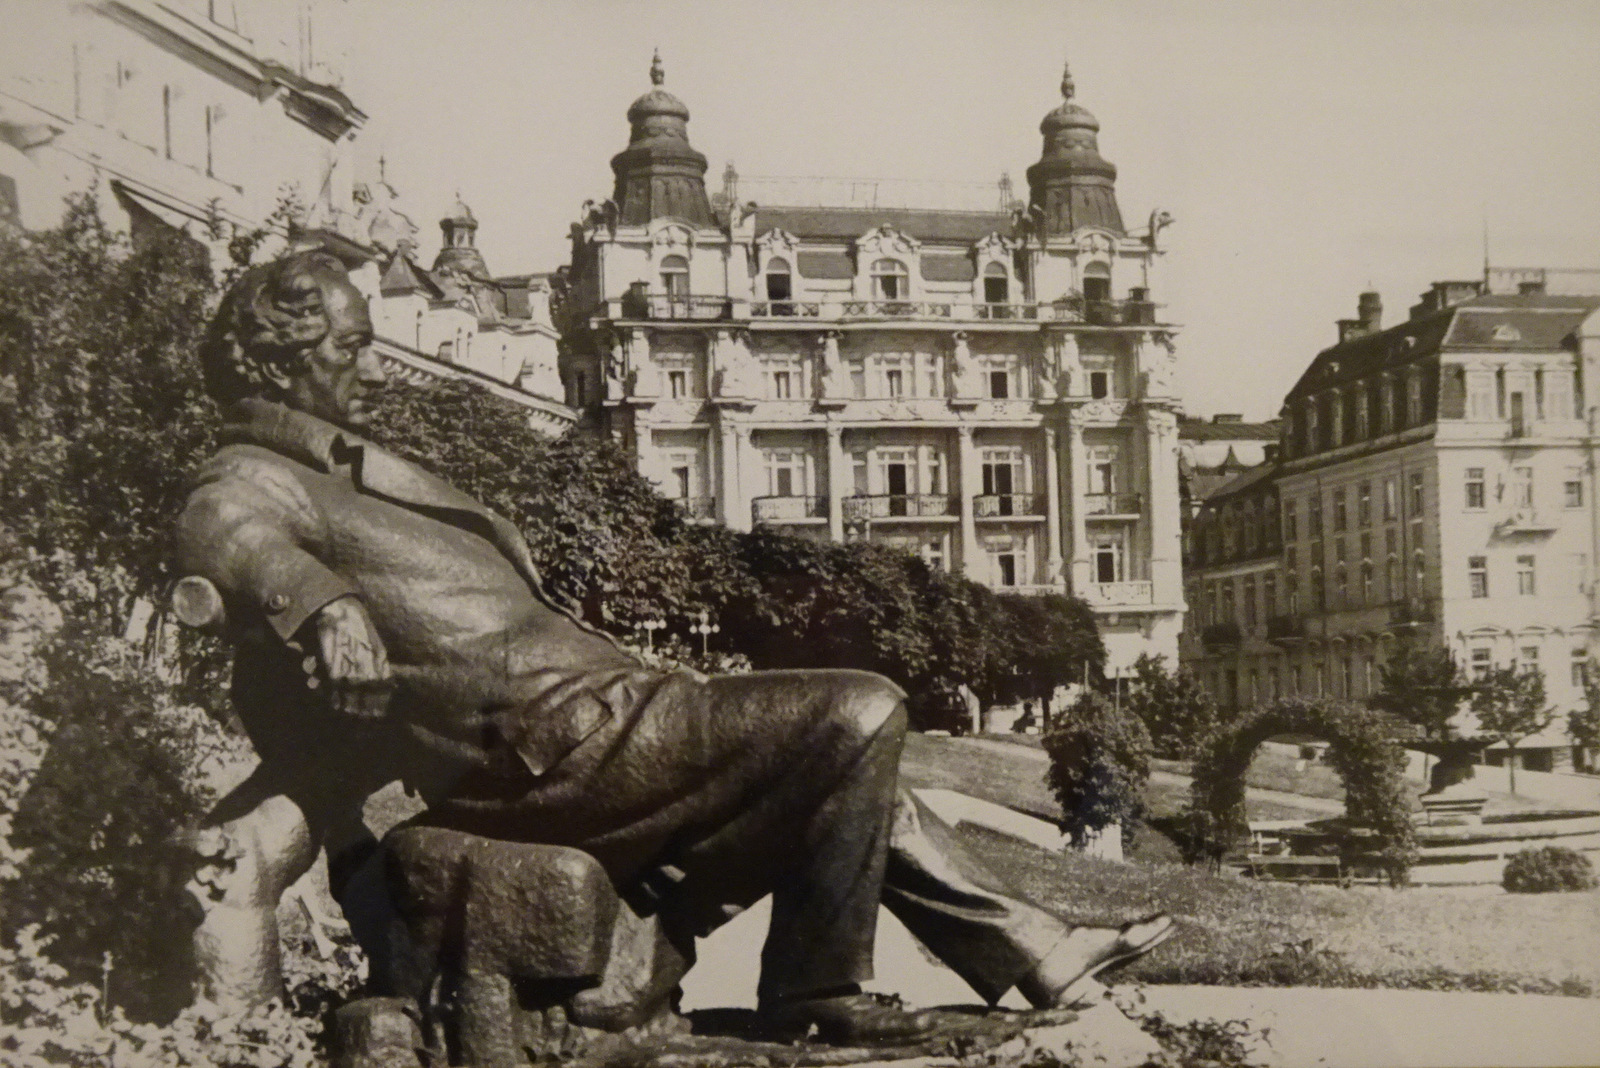 Goethestatue alt